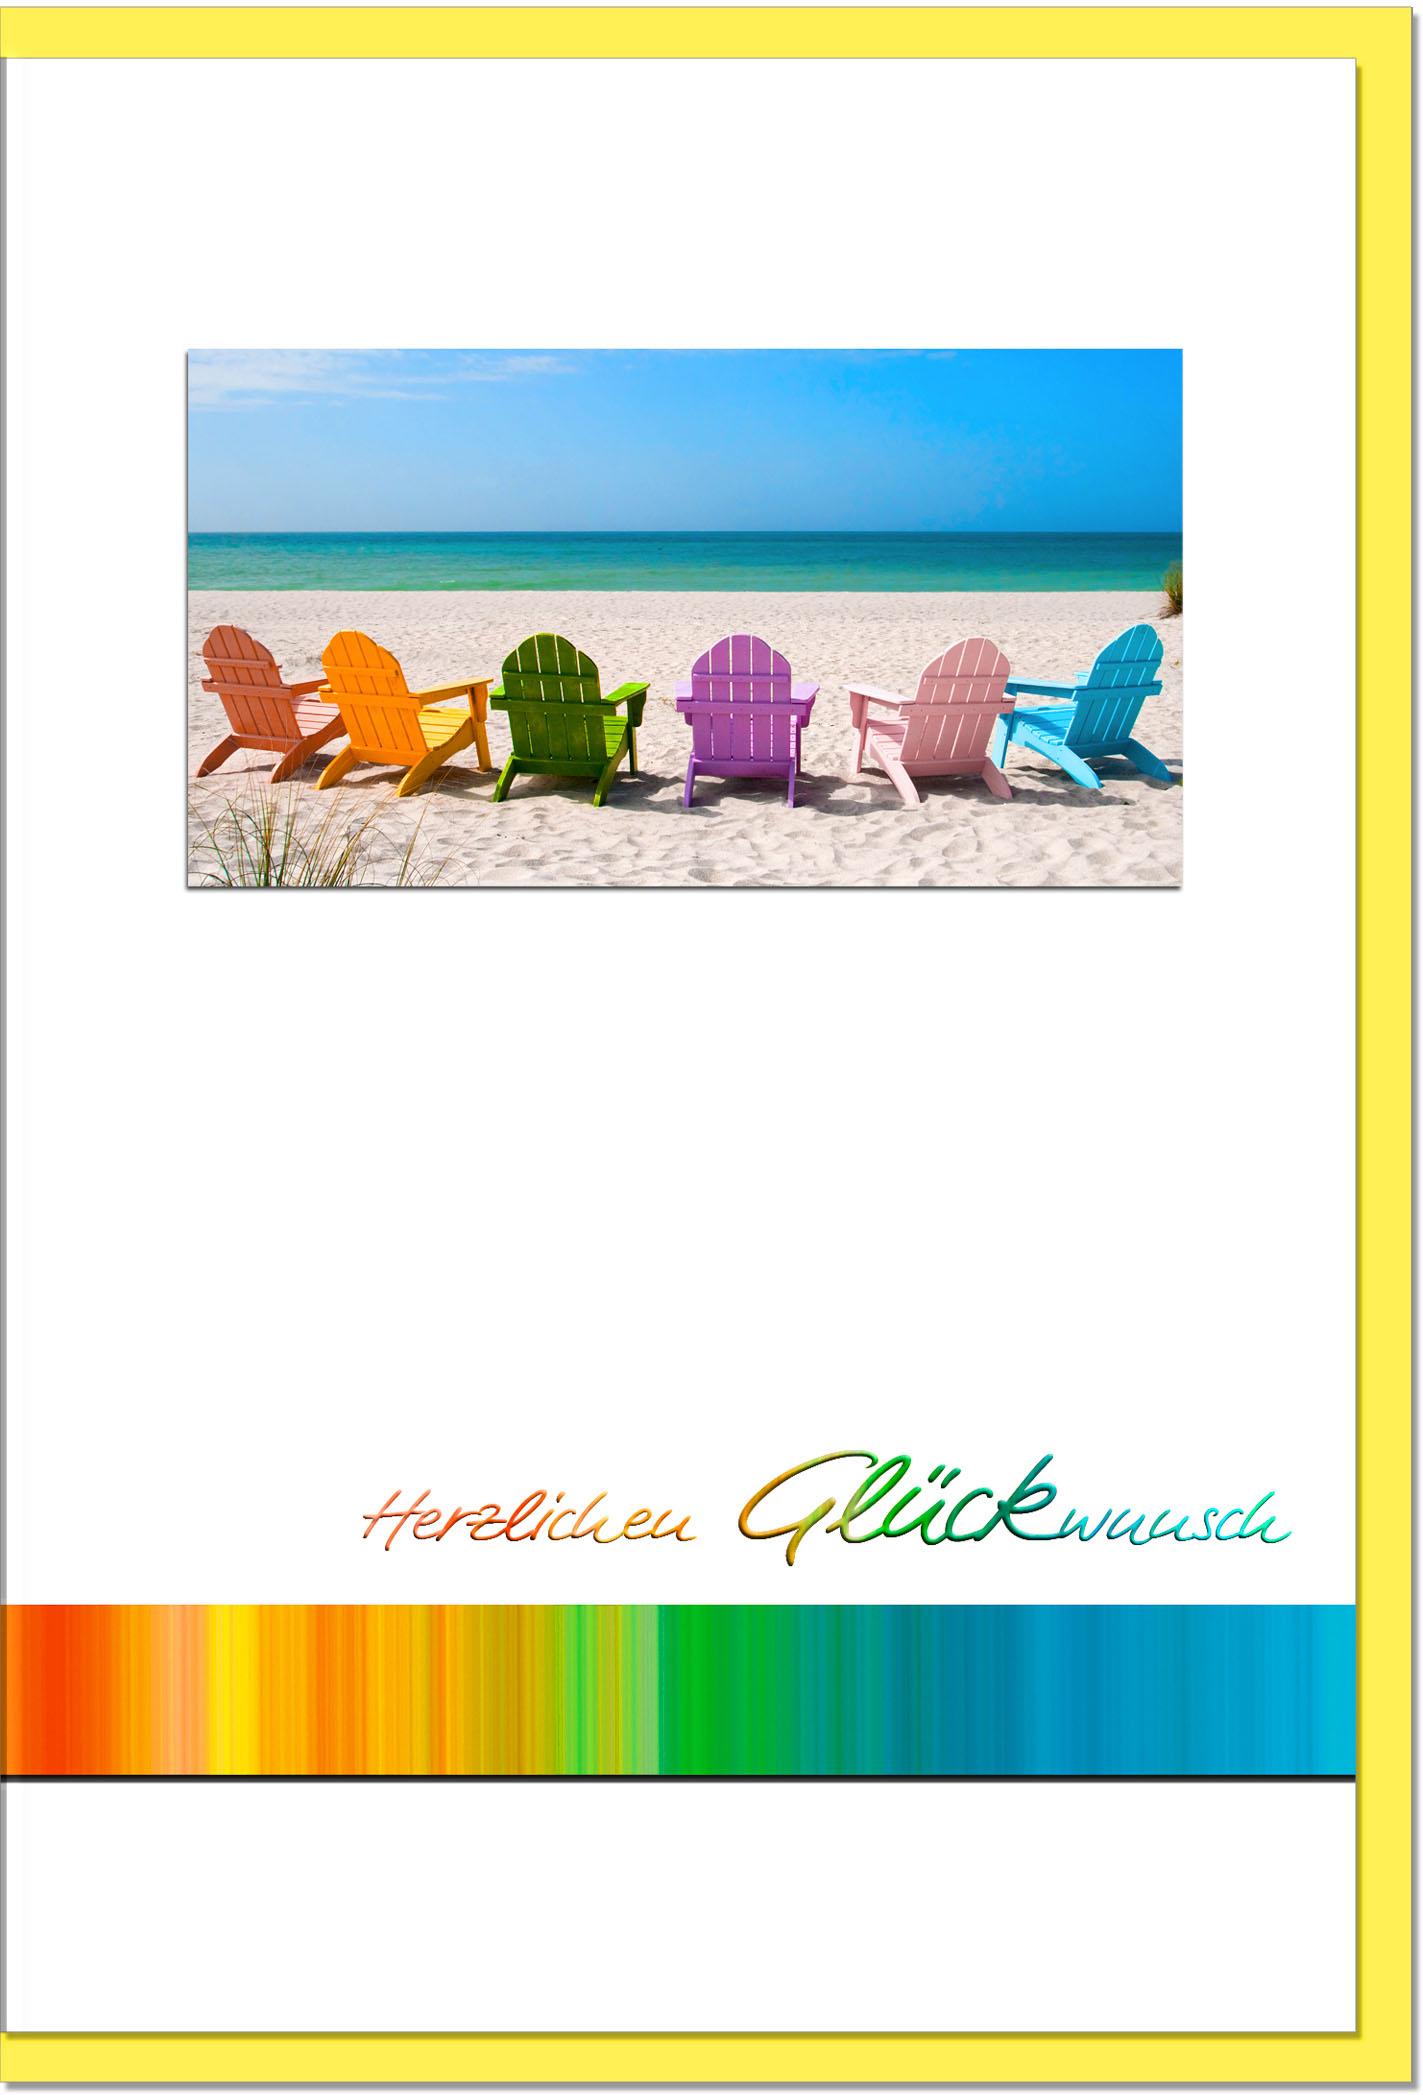 Glückwunschkarten / Grußkarten /Glückwunsch Strand